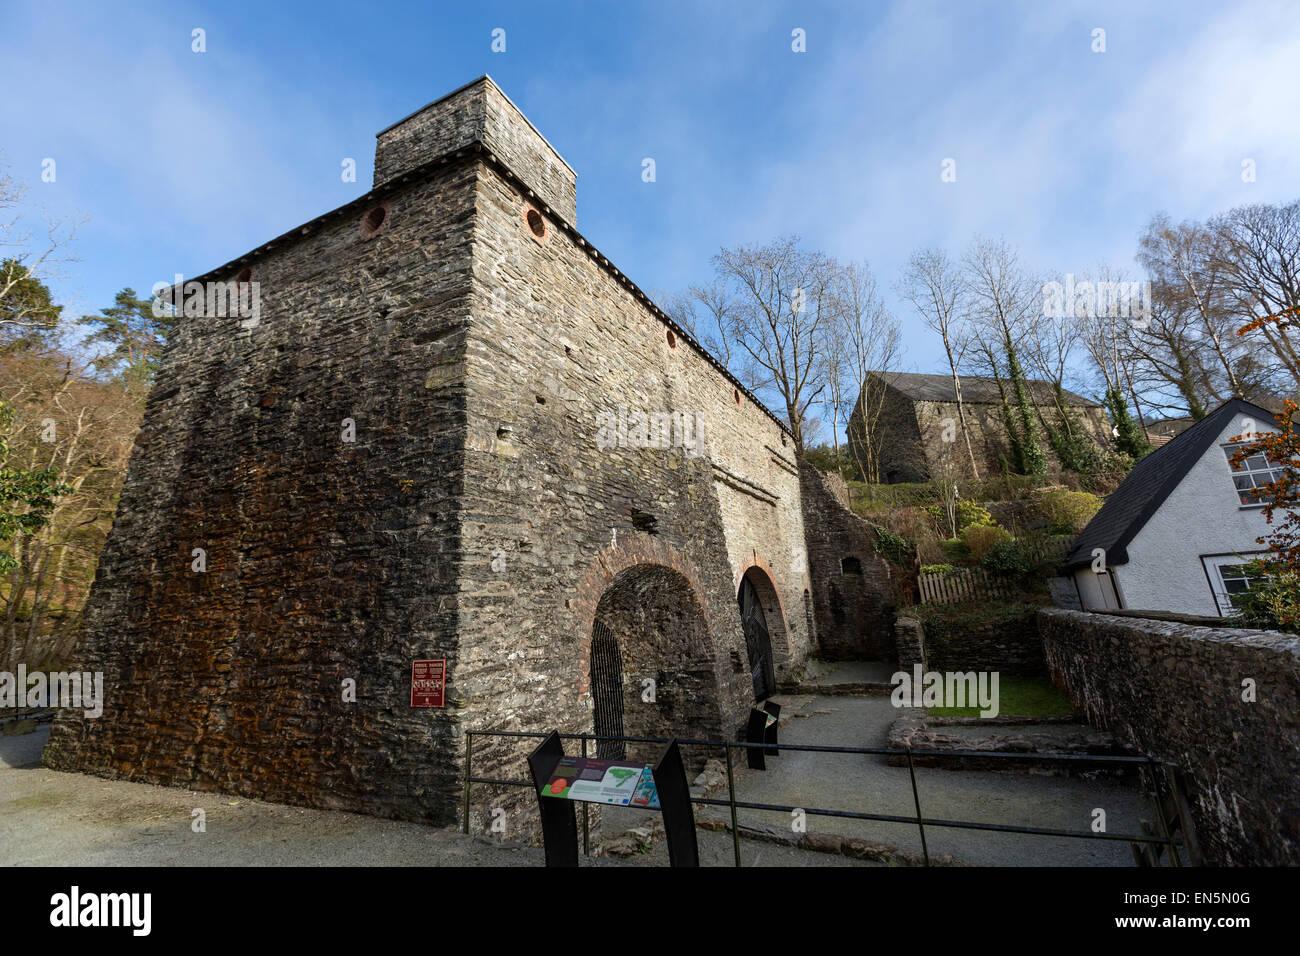 Dyfi Furnace, Ceredigion, Wales , United Kingdom - Stock Image